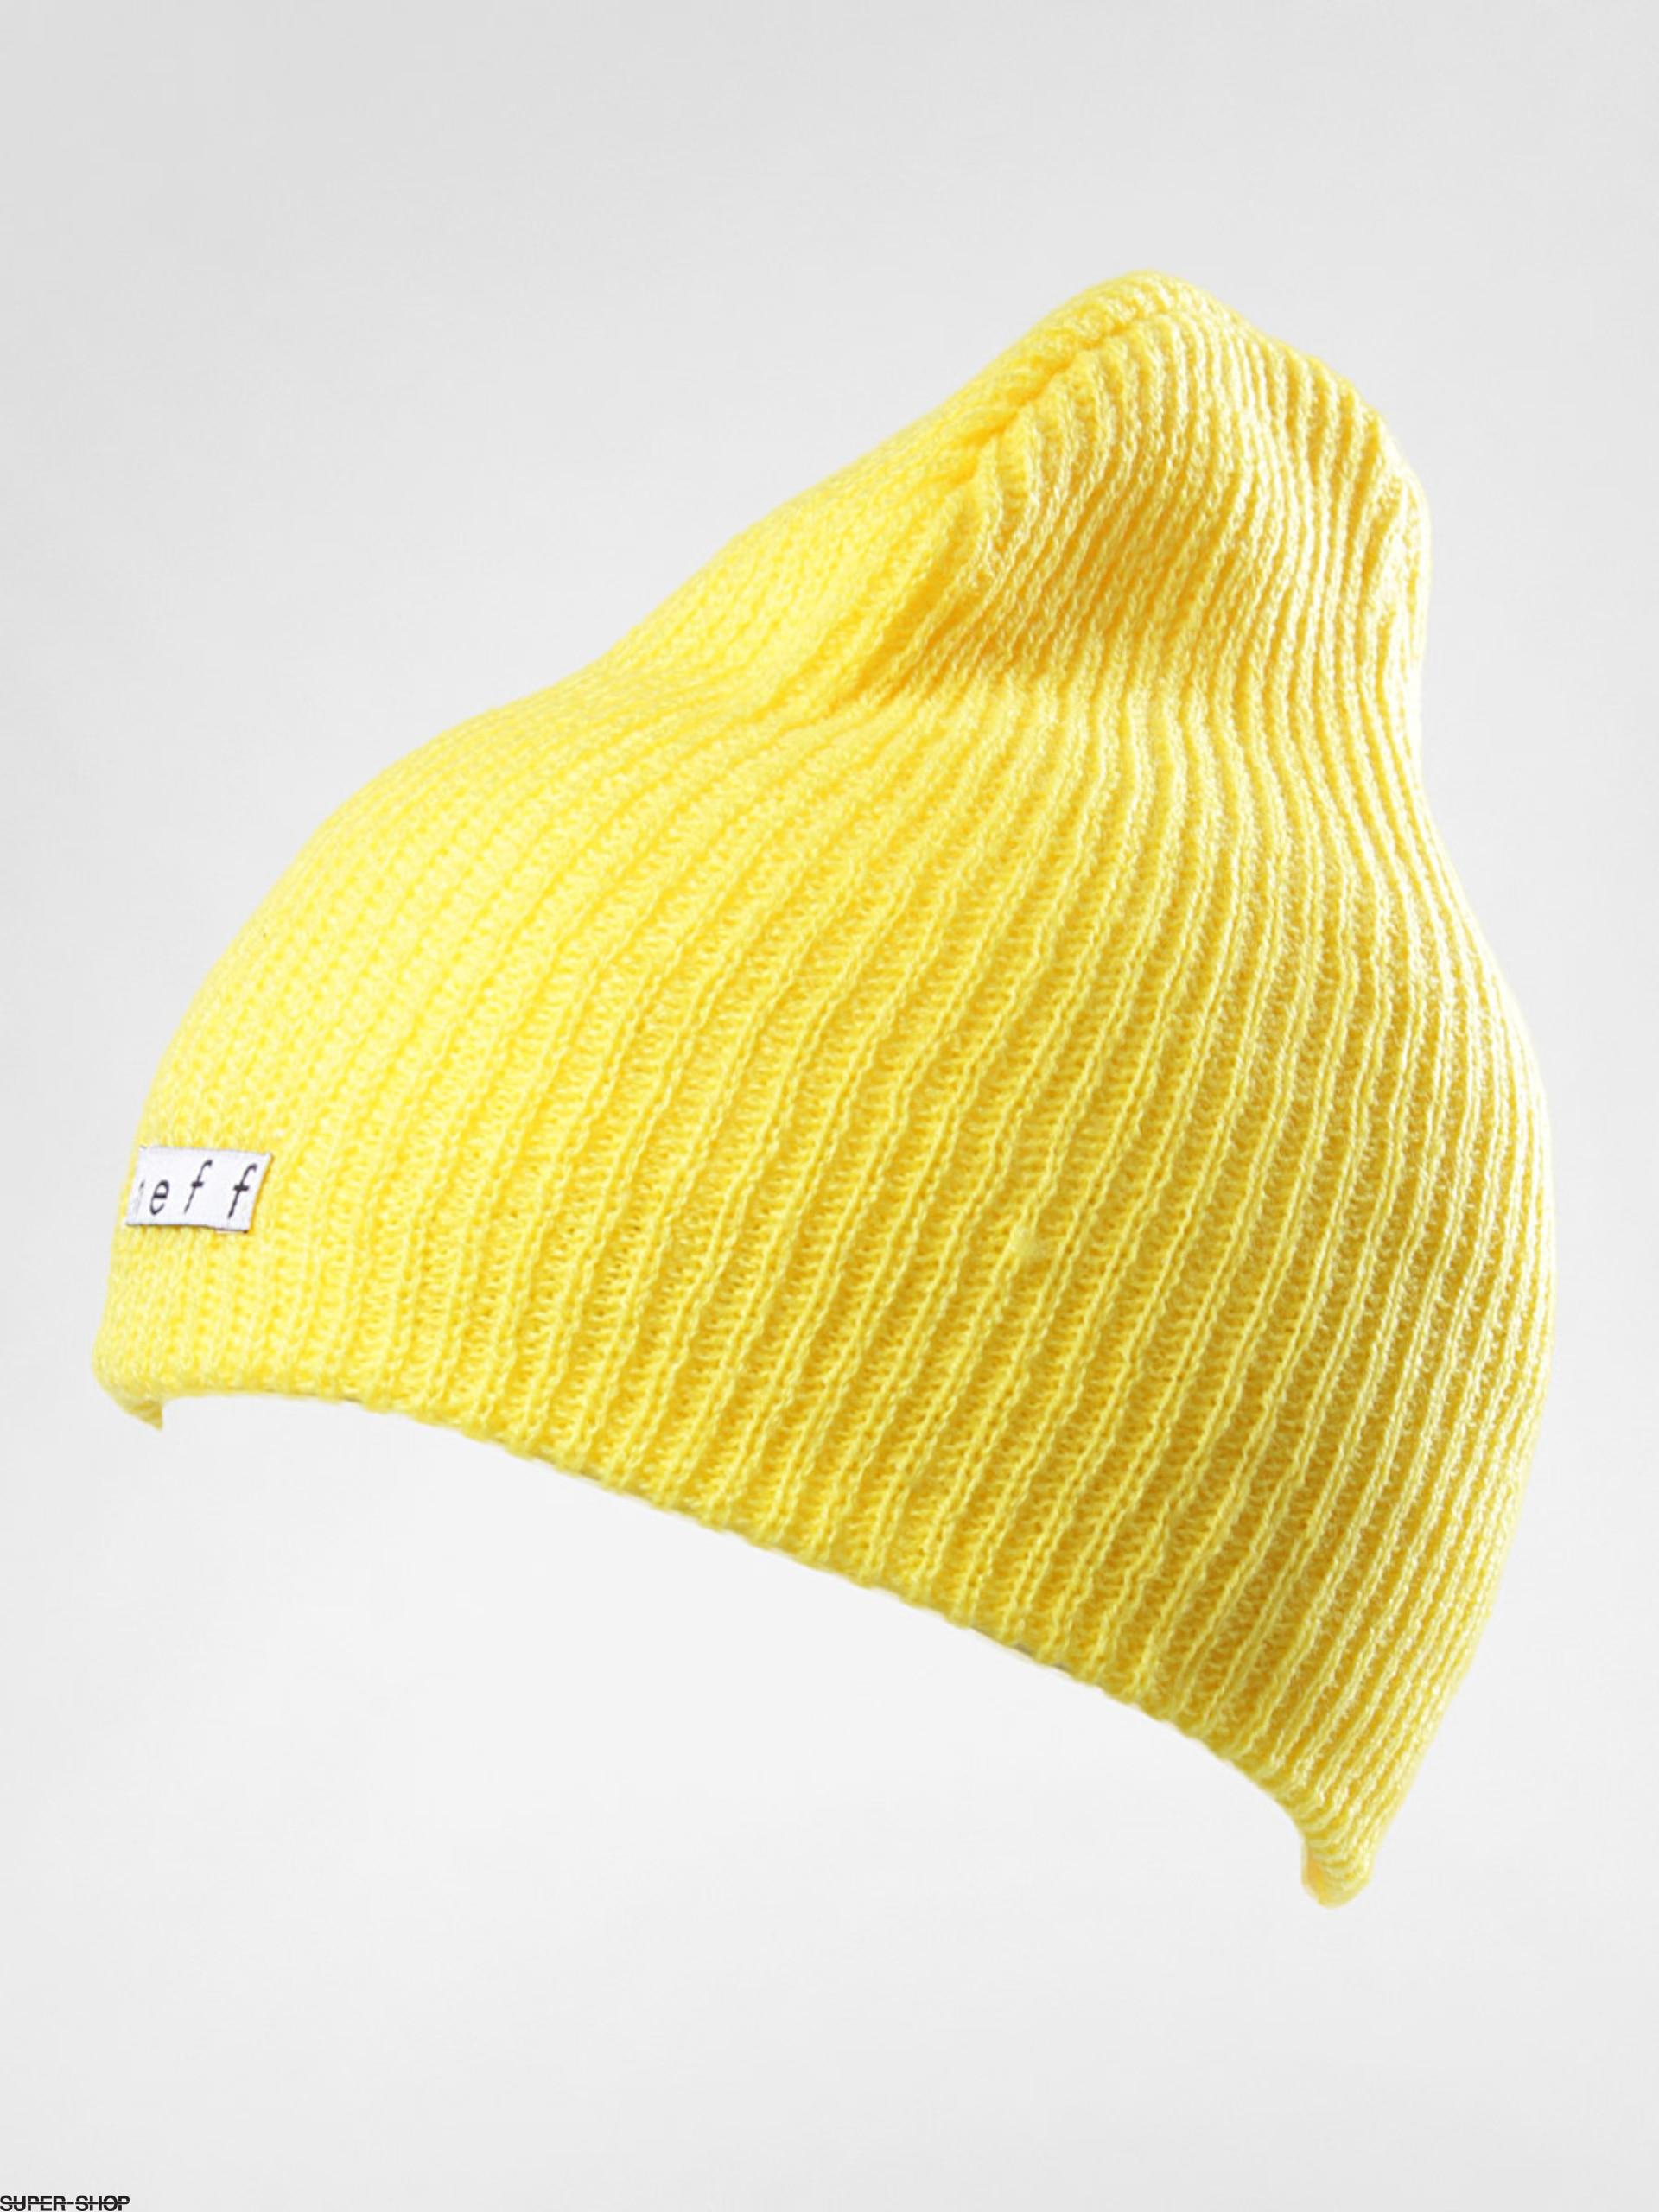 0fbfd1c35d7 537578-w1920-neff-beanie-daily-yellow.jpg